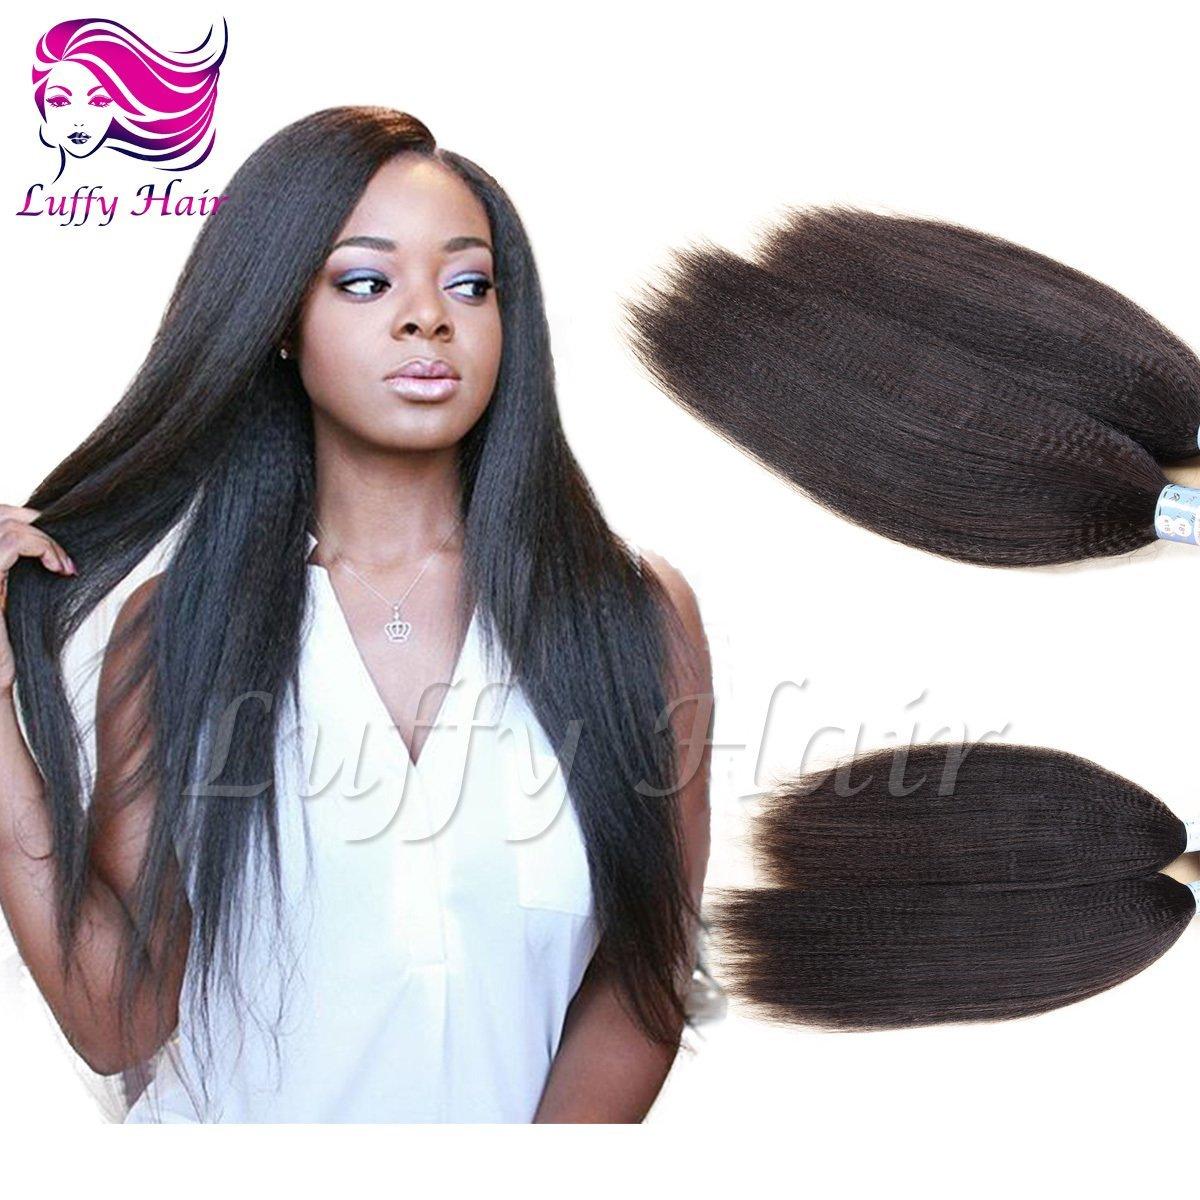 8A Virgin Human Hair Italian Yaki Straight Fusion Hair Extensions - KFL010